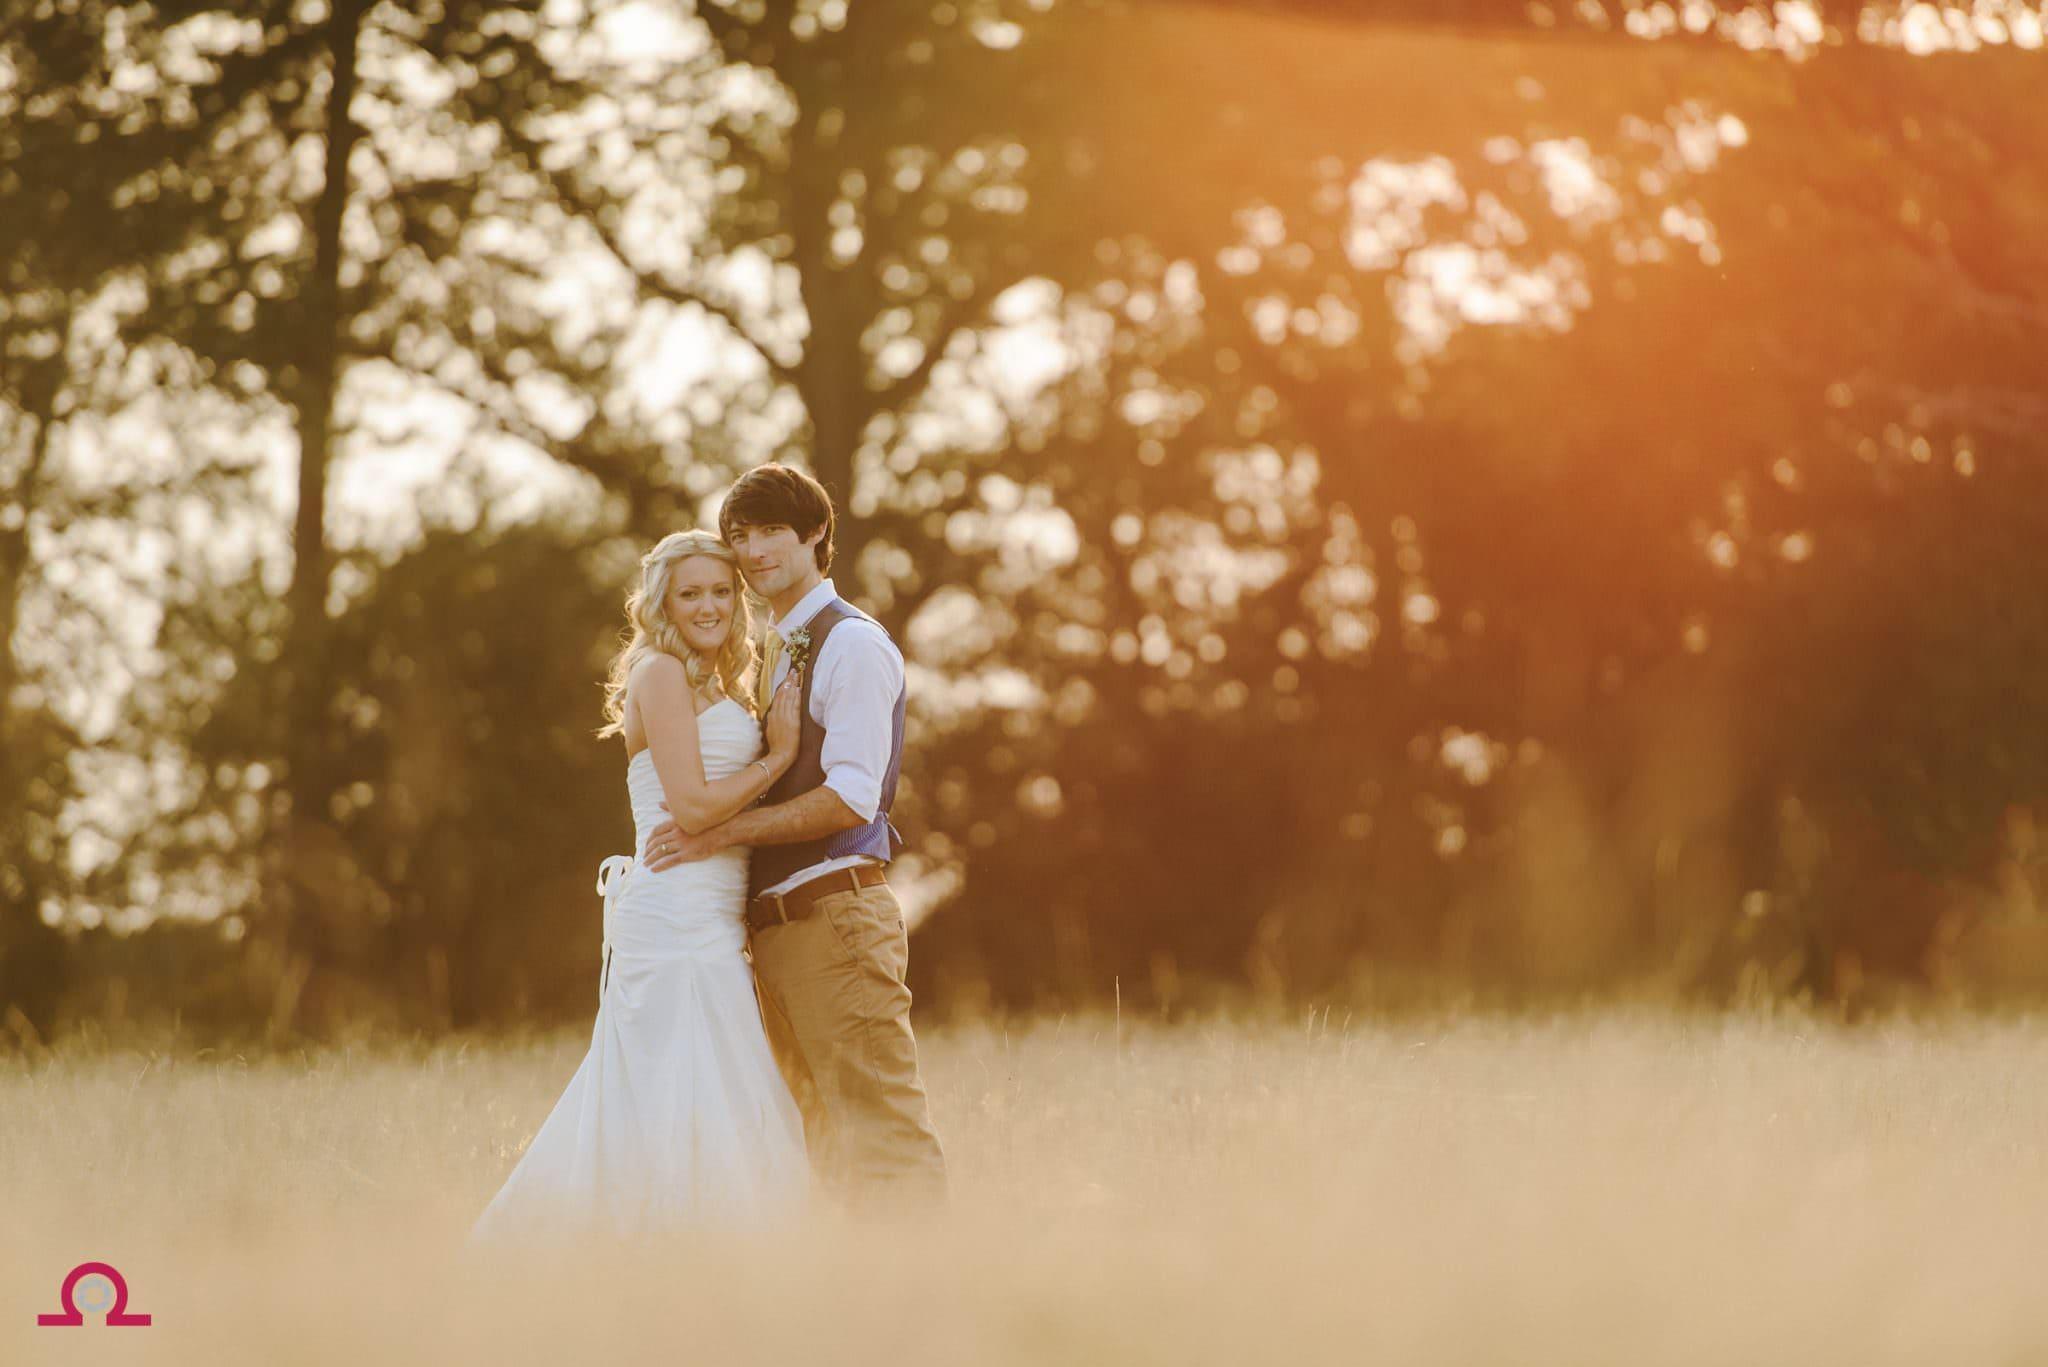 Summer meadow wedding